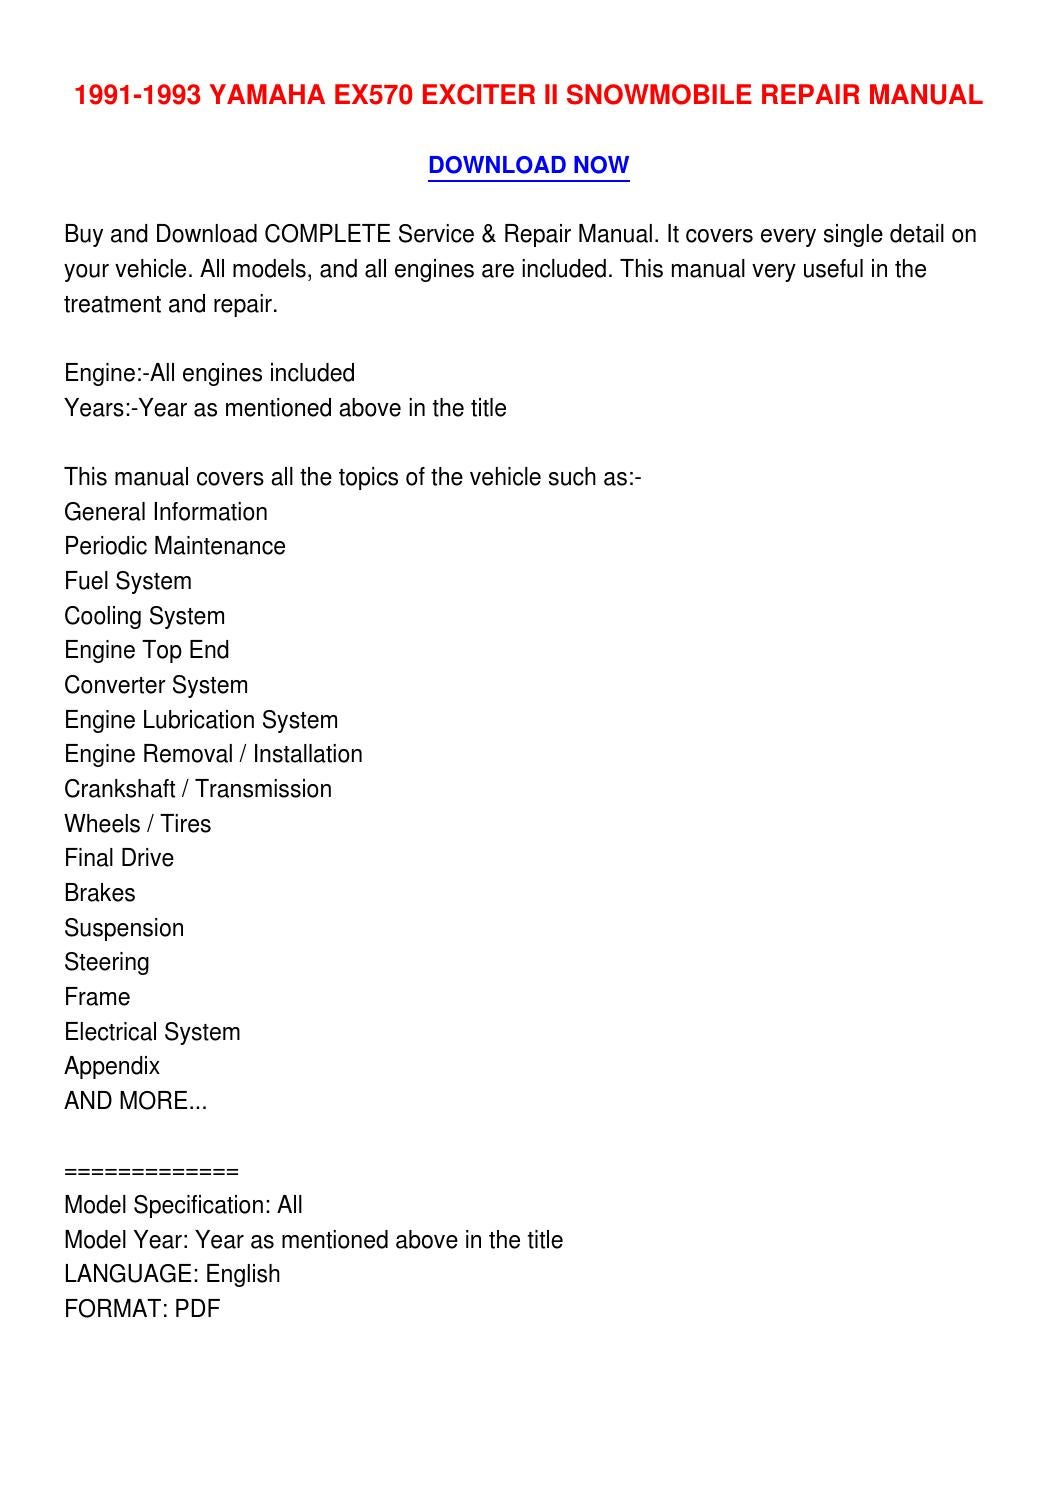 Yamaha exciter Ex570 service Manual